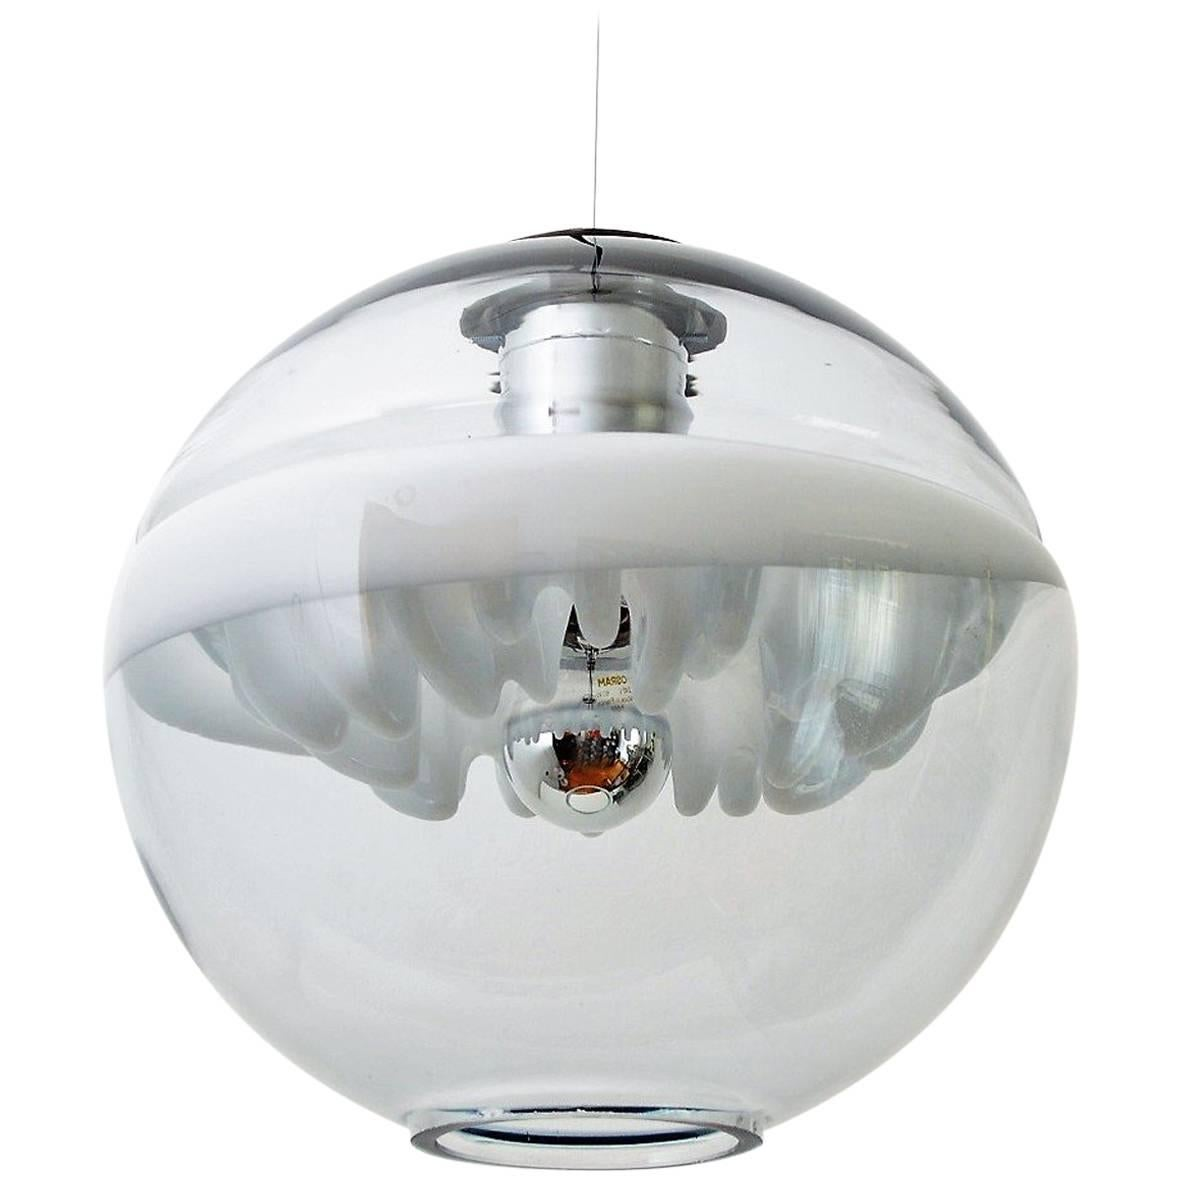 Space Age Pendant Lamp by Toni Zuccheri for Venini, Italy